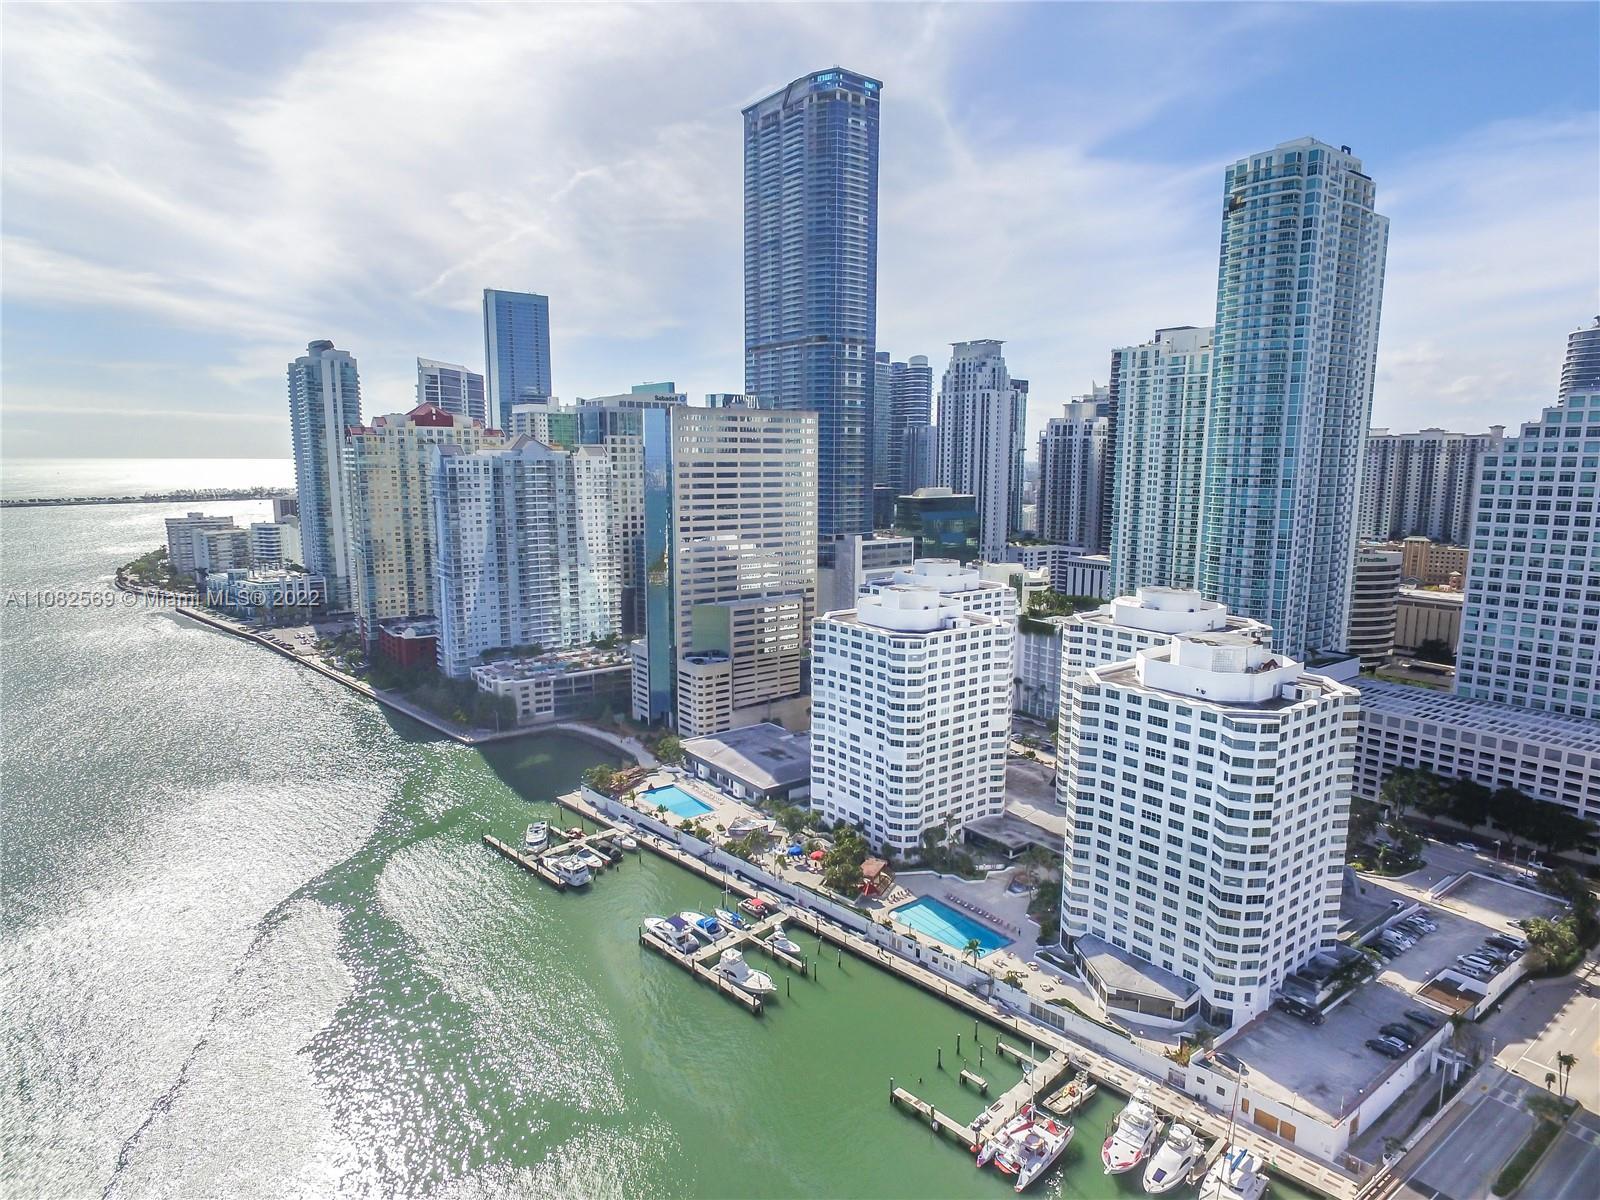 Courts Brickell Key #470 - 801 Brickell Bay Dr #470, Miami, FL 33131